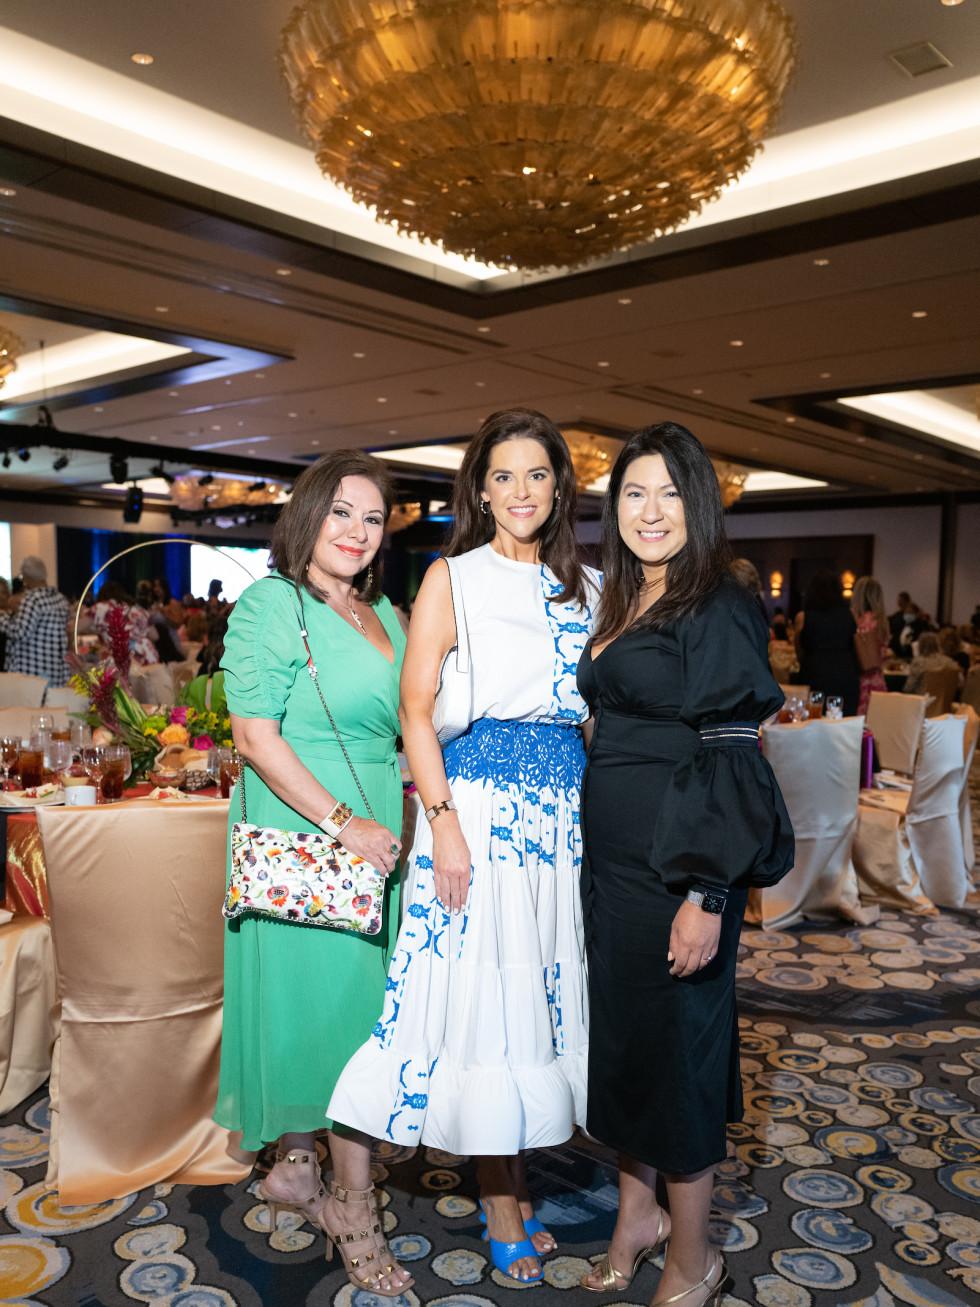 LWI Houston 2021 fashion show luncheon Debbie Festari, Ann Ayre, , Ileen Martinez